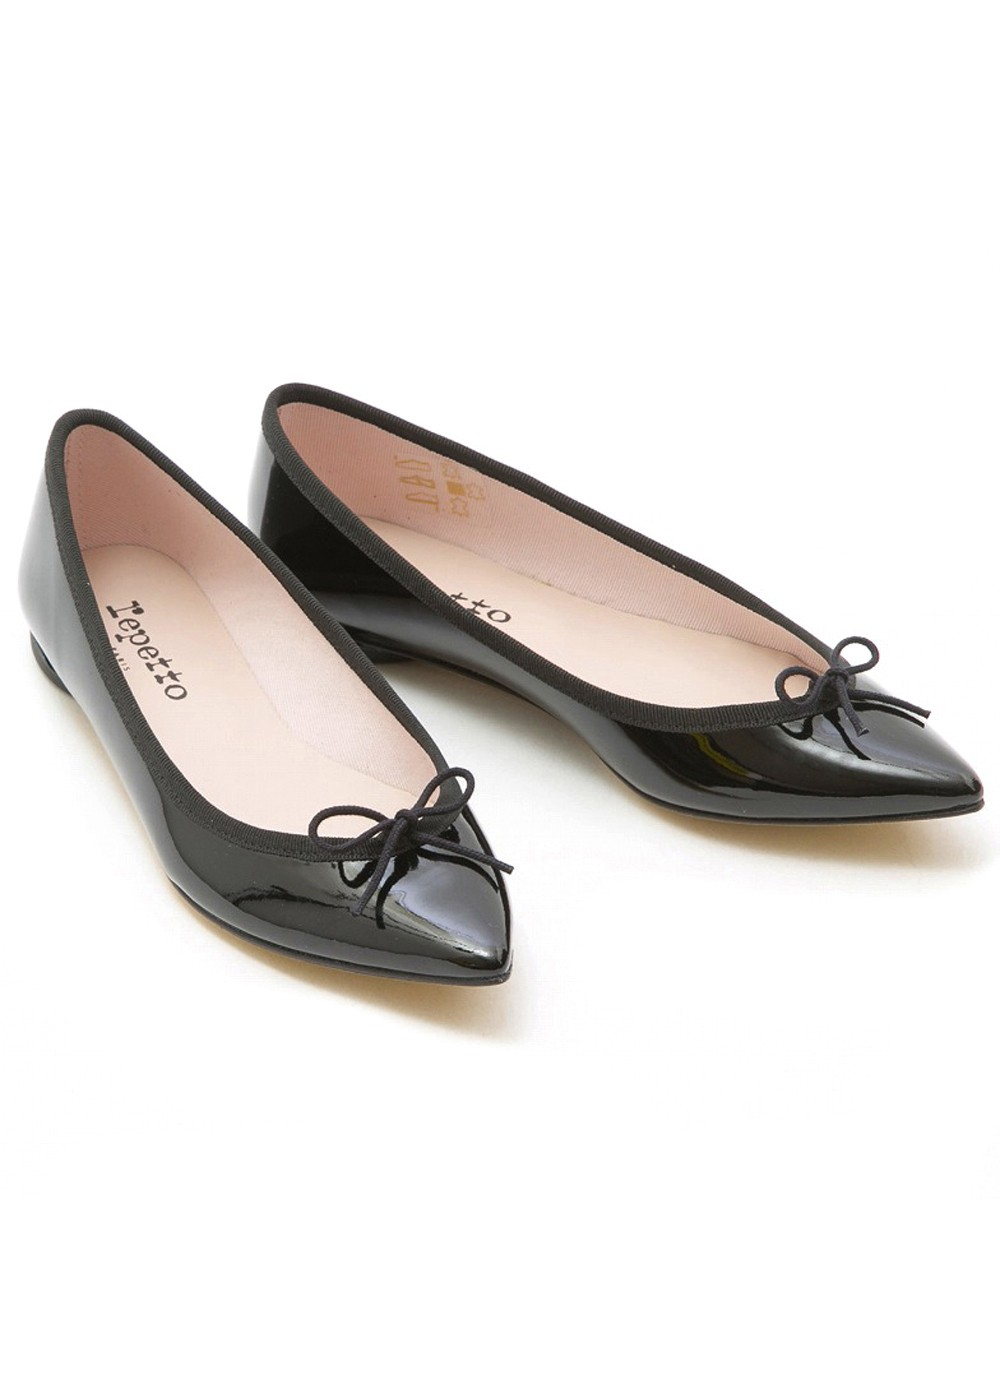 a7da349e62975a おしゃれで人気なバレエシューズ?!レペットの靴おすすめランキング第14位「バレリーナ ブリジット」の詳細